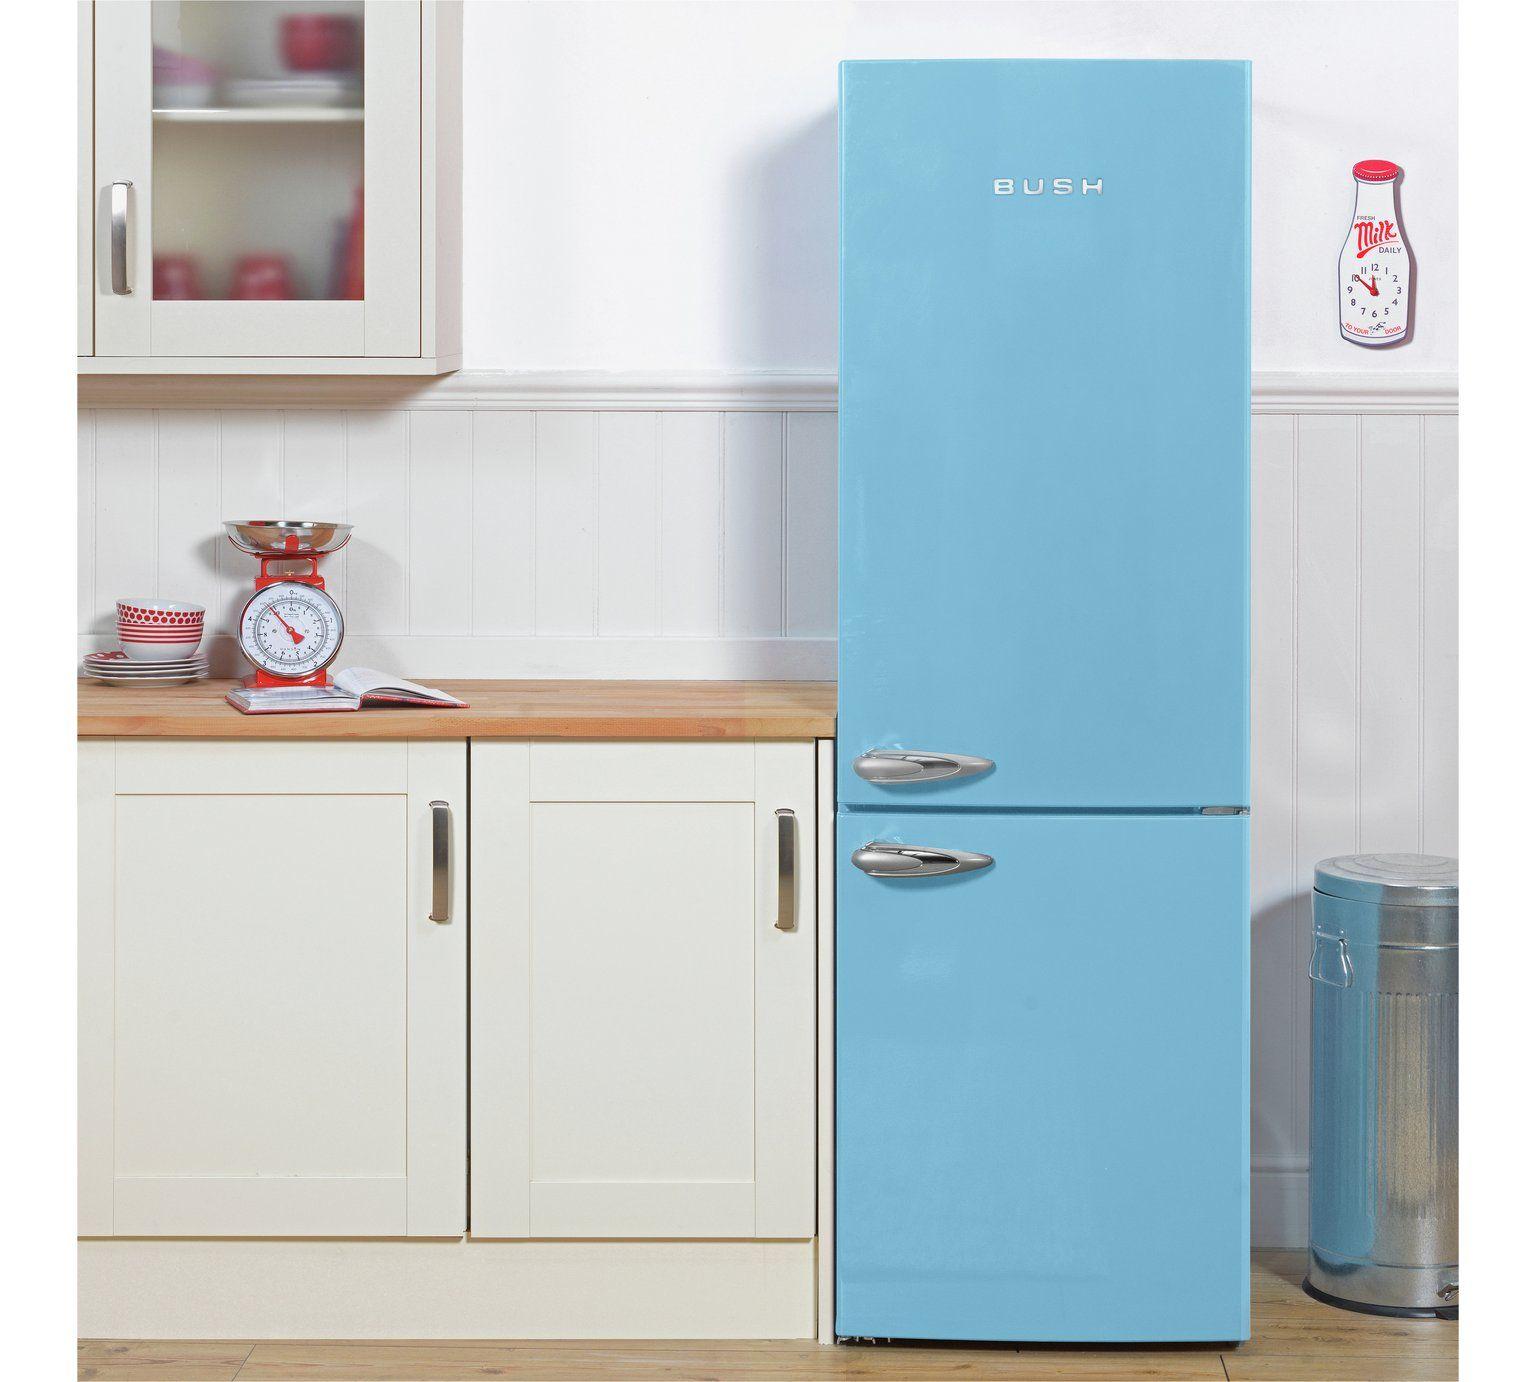 Buy Bush Classic BFFF60 Retro Fridge Freezer - Blue at Argos.co.uk ...